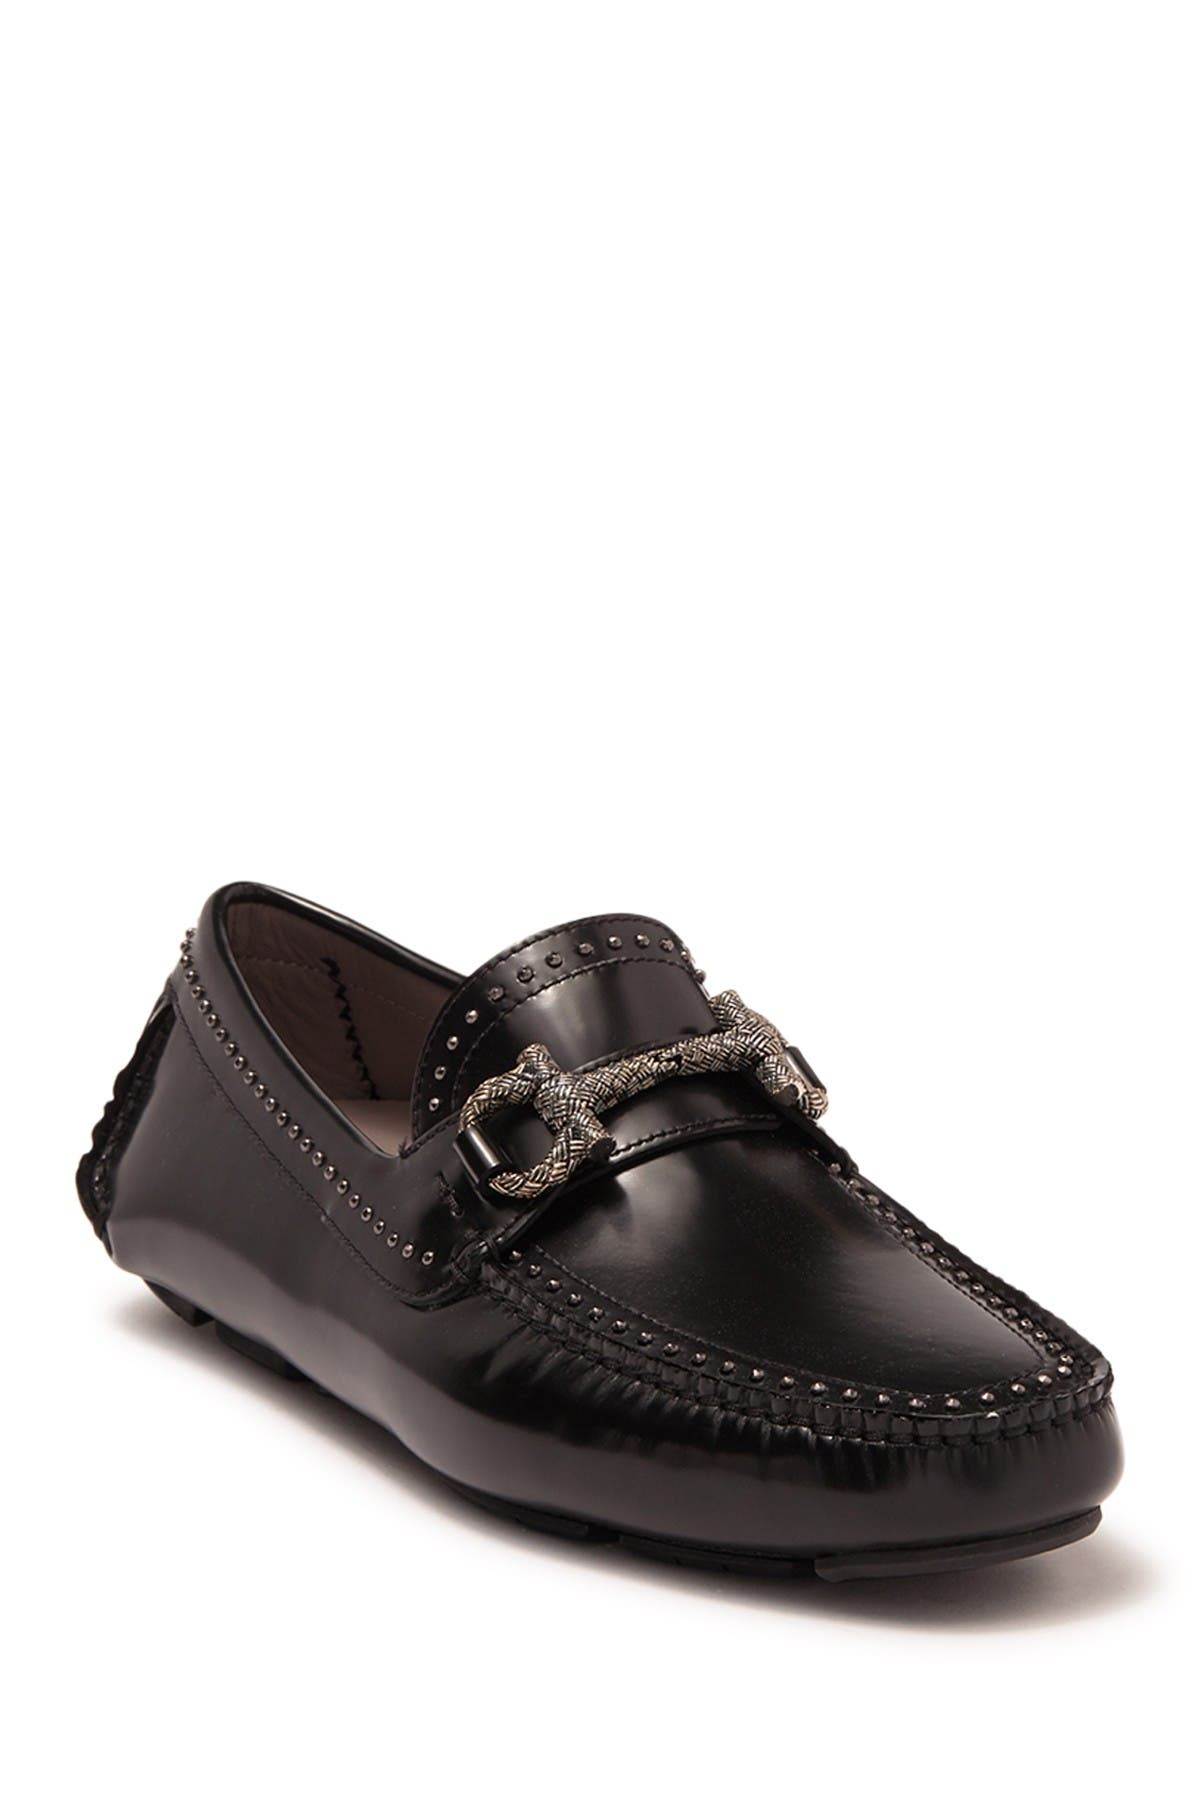 Image of Salvatore Ferragamo Horsebit Studded Leather Loafer